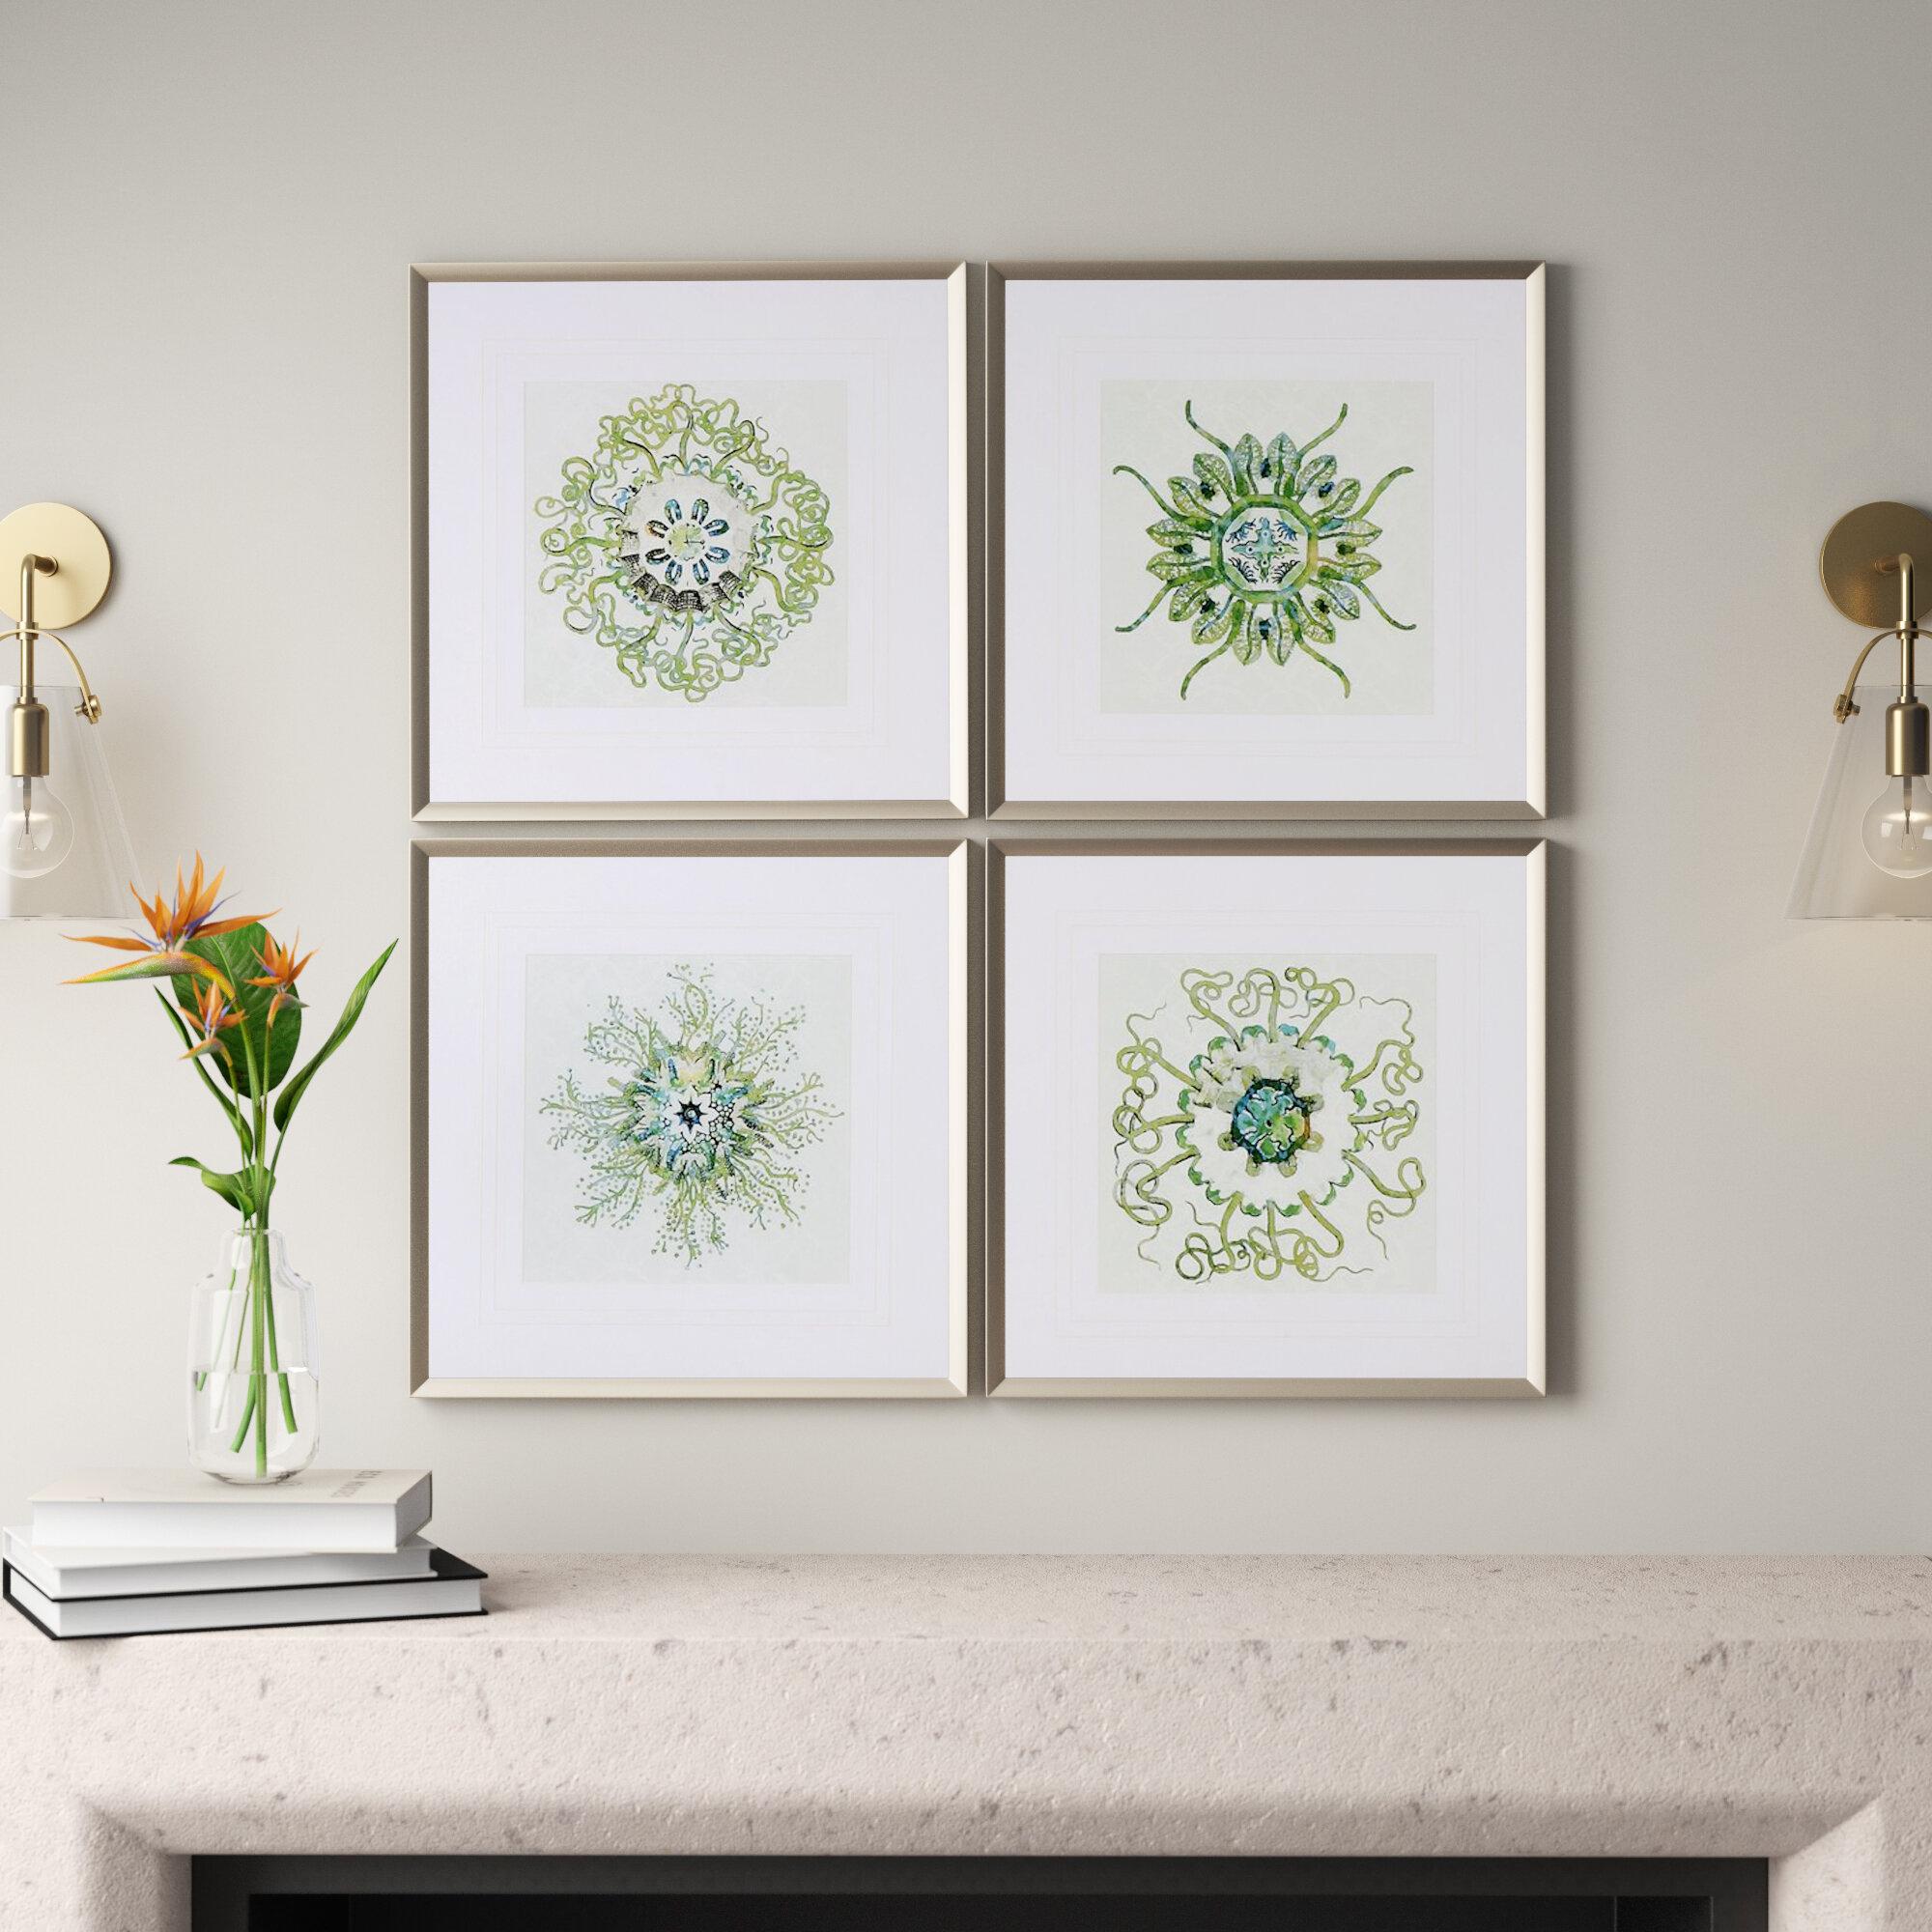 Wall Art | Joss & Main regarding 3 Piece Acrylic Burst Wall Decor Sets (Set of 3) (Image 30 of 30)